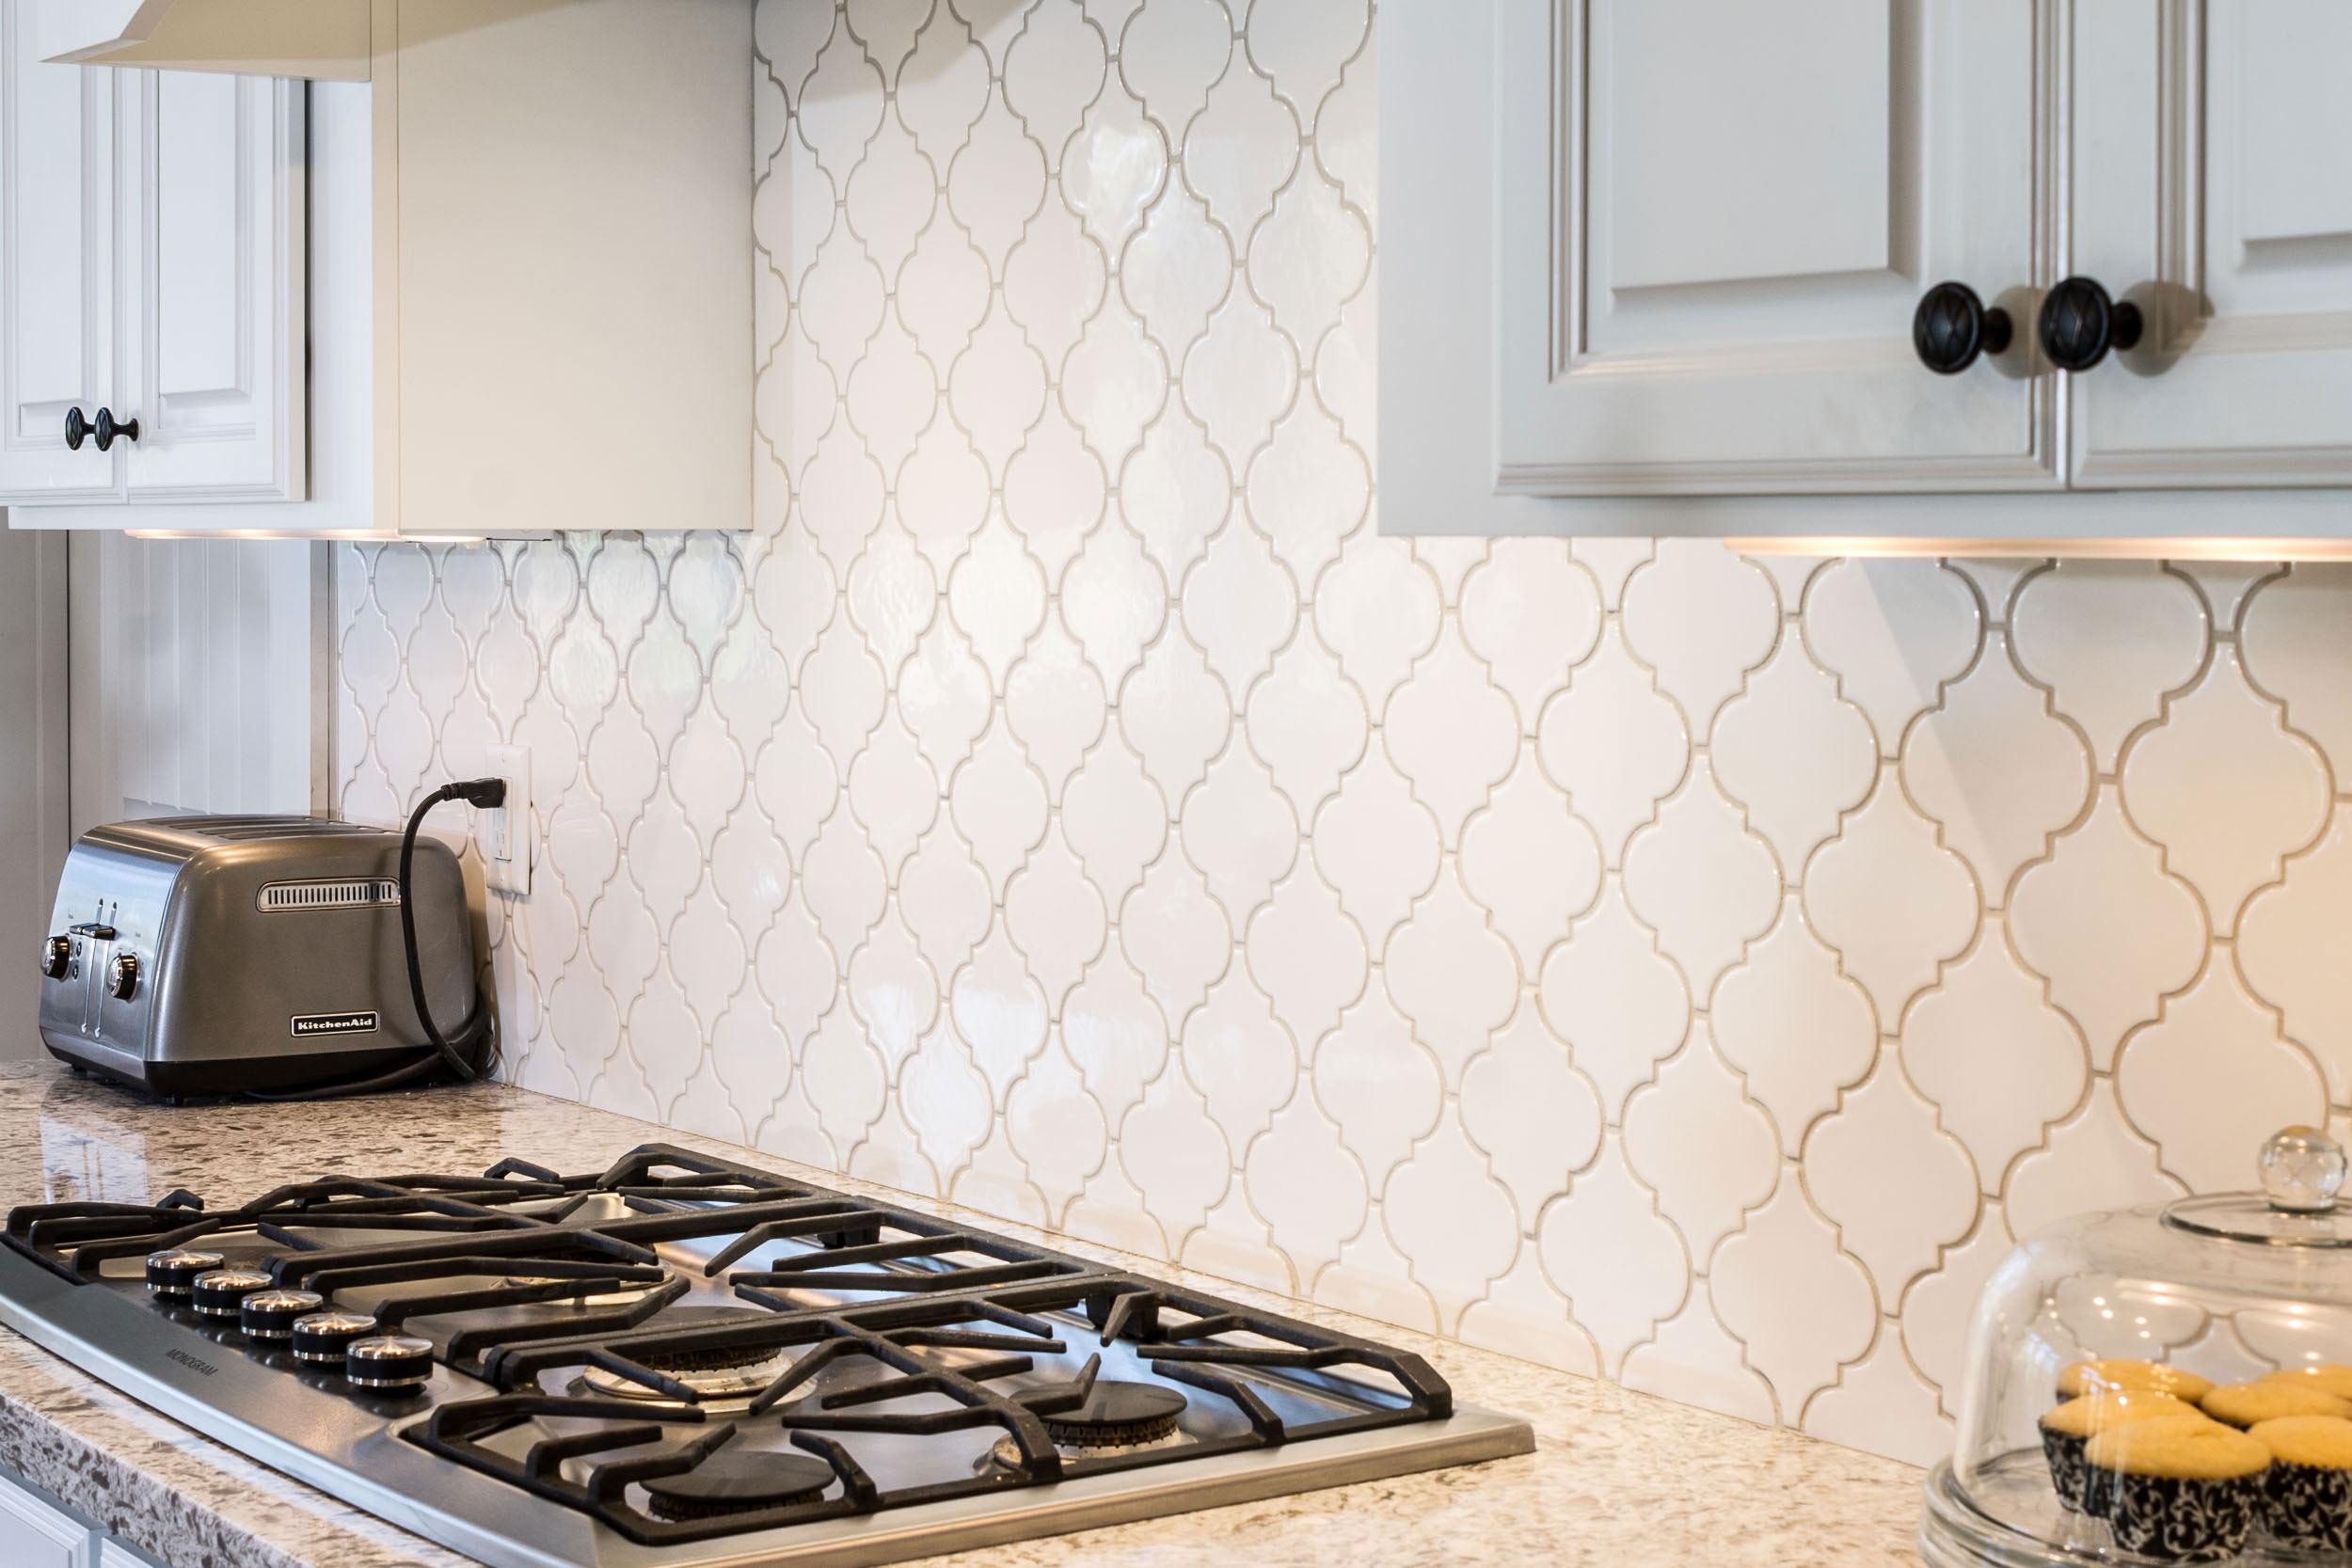 Arabesque tile in Gloss White with Silverado Tec grout